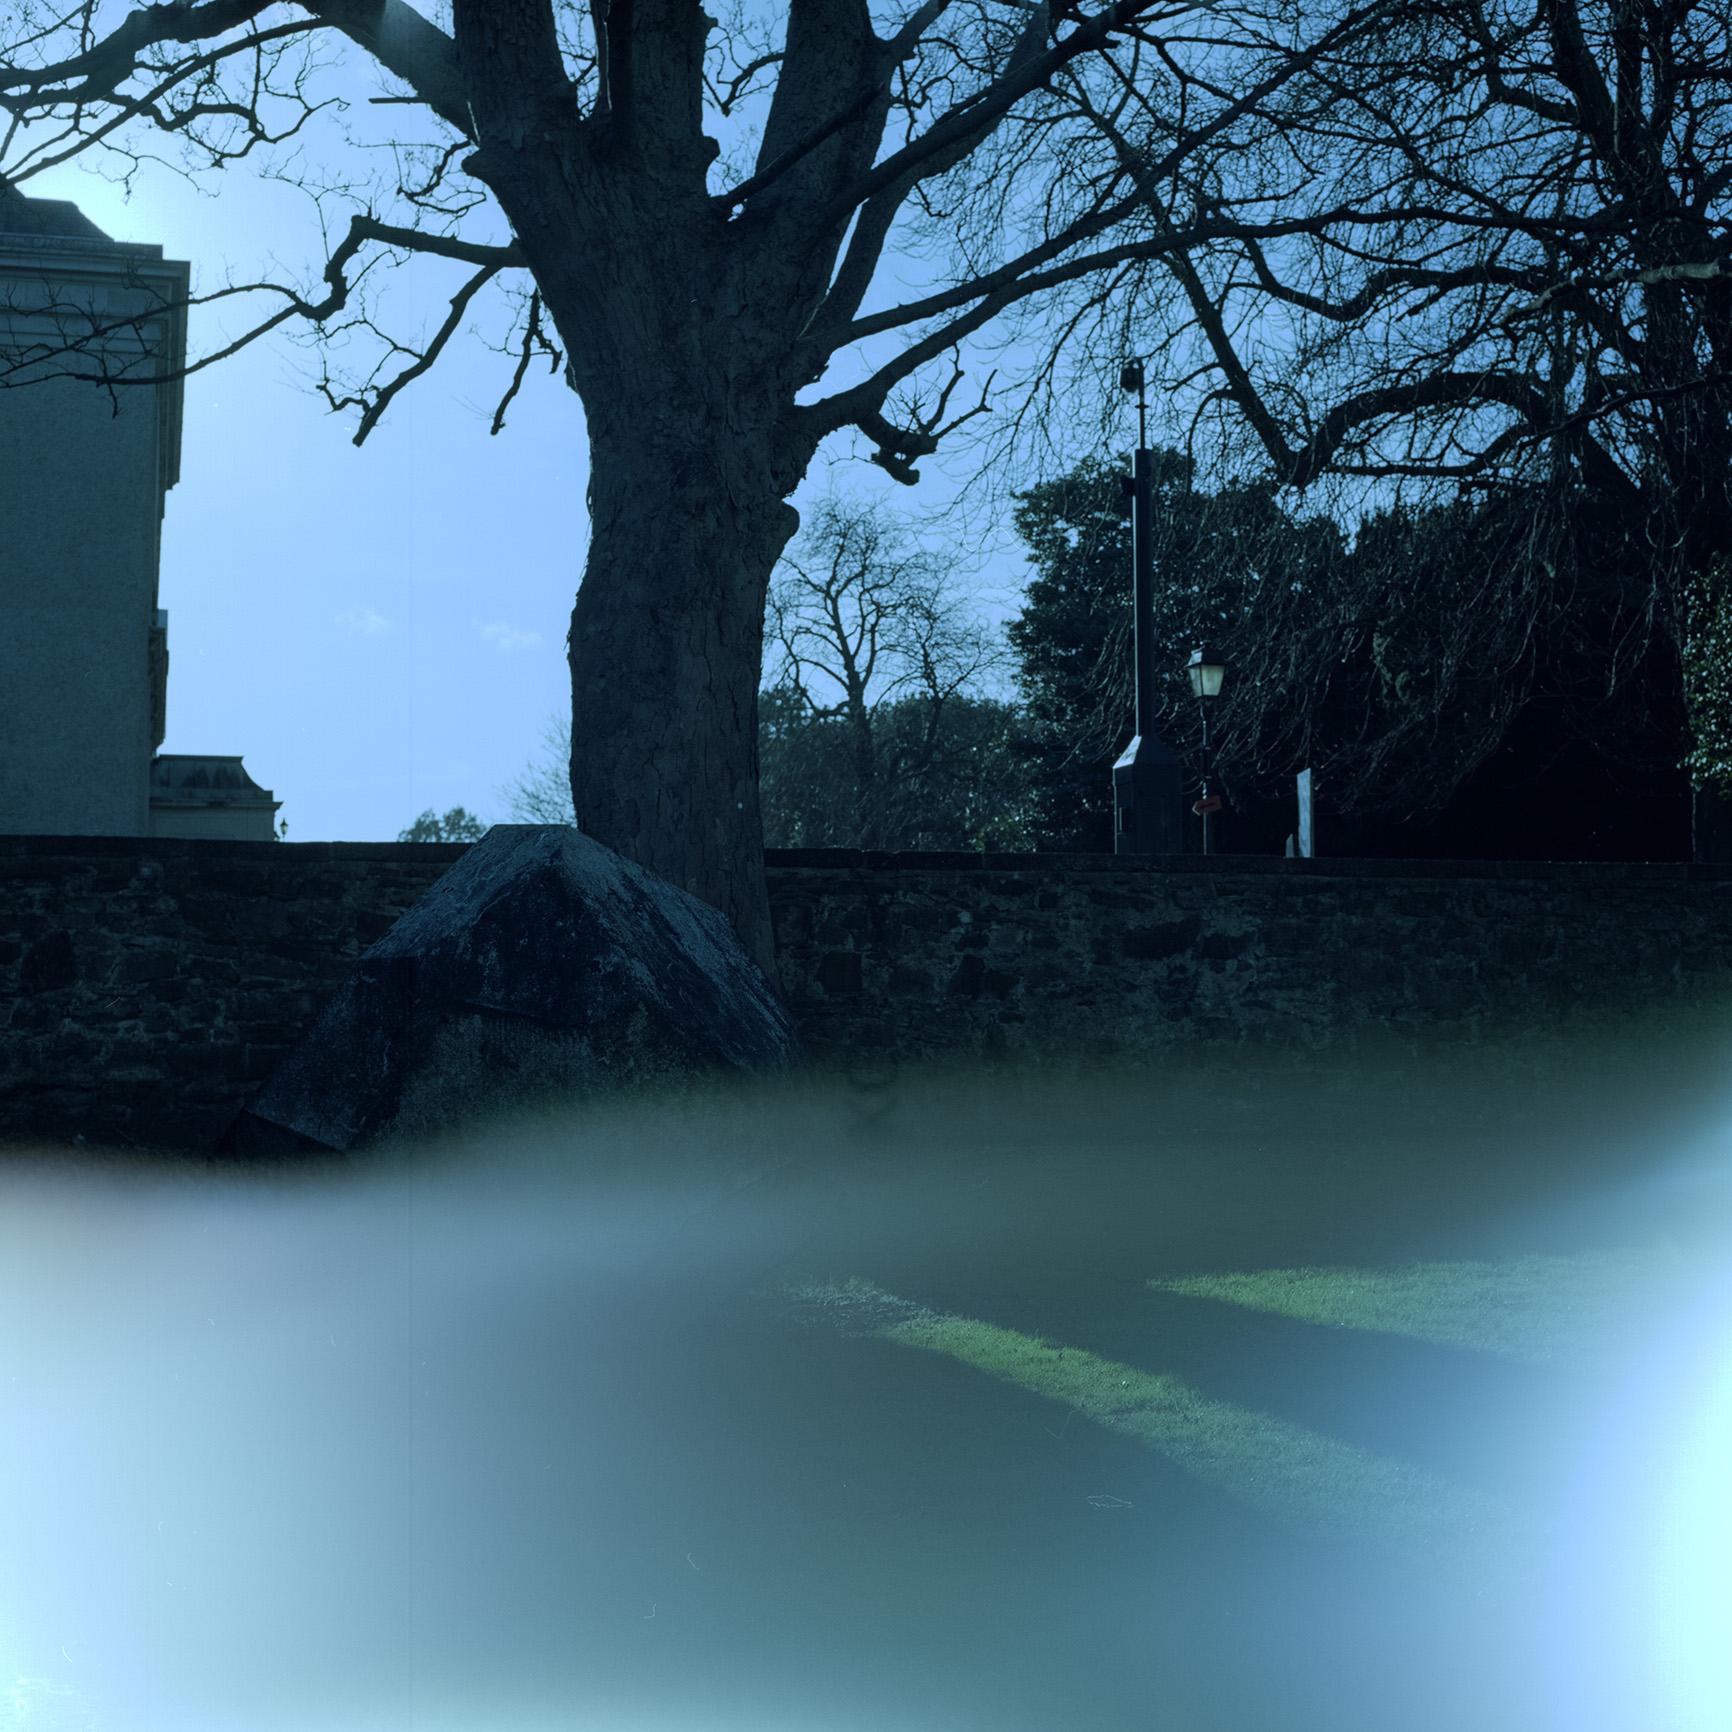 Camera: Hasselblad 500C/M  Film: Kodak New Portra 160  Location: IMMA, Dublin, Ireland